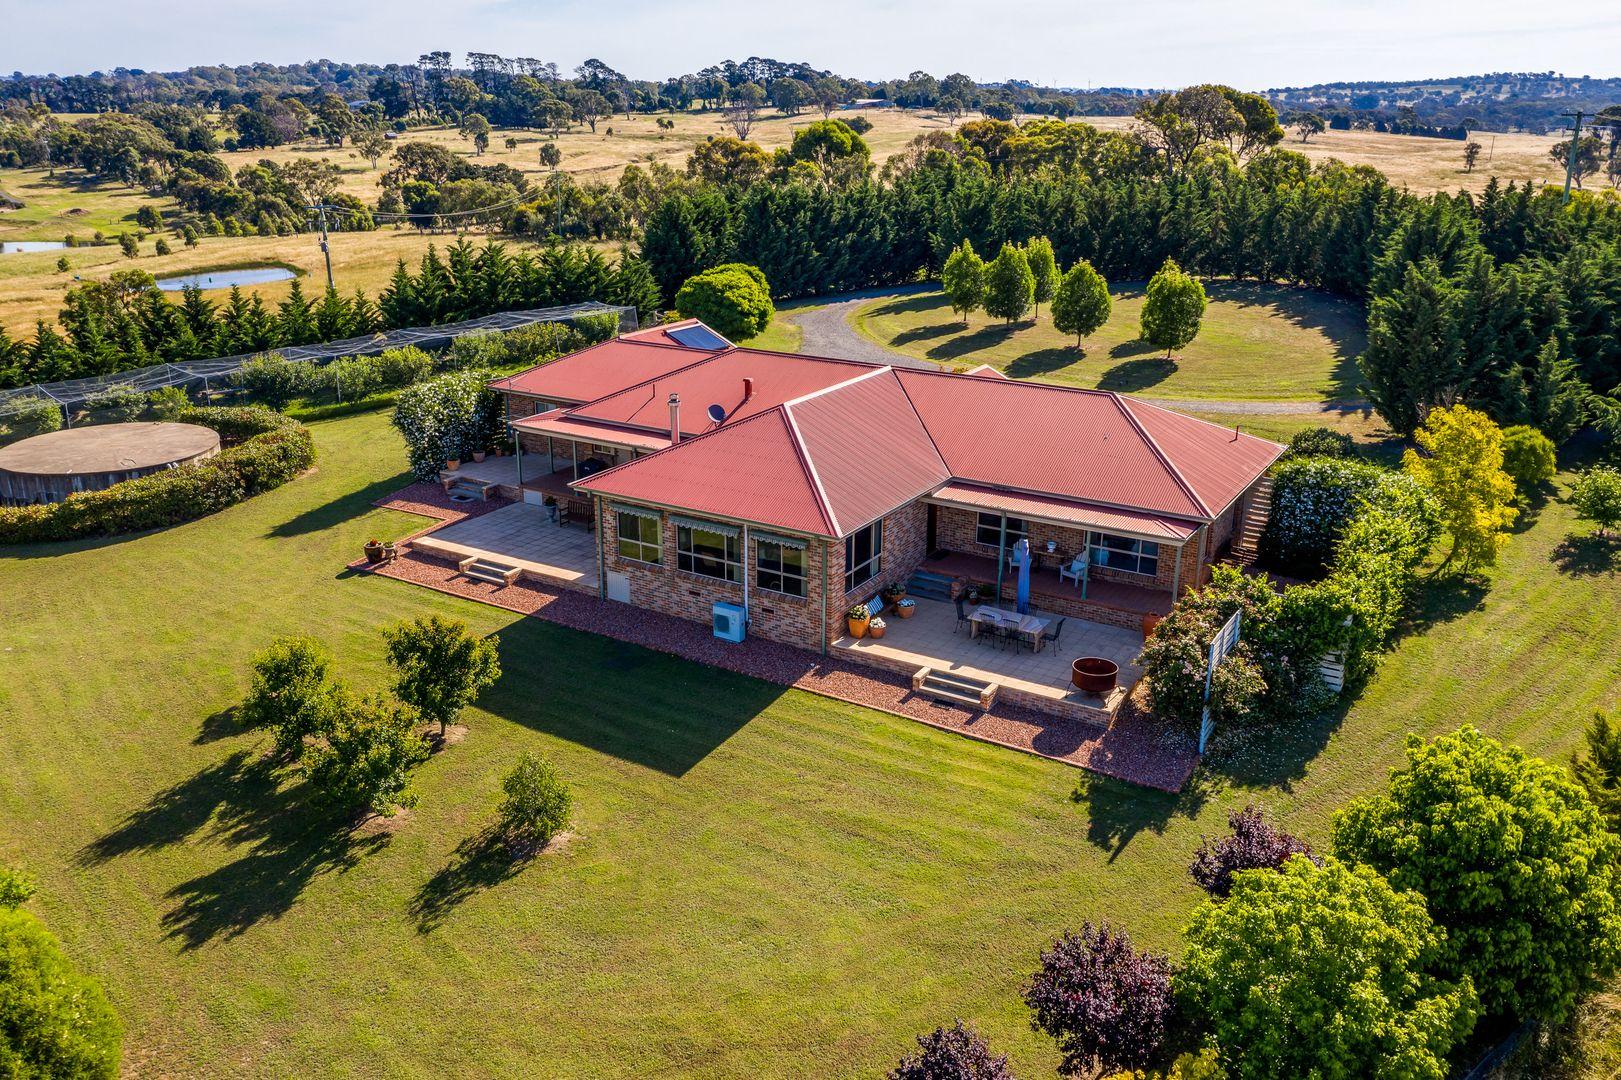 145 Merilla Lane Parkesbourne via, Goulburn NSW 2580, Image 0